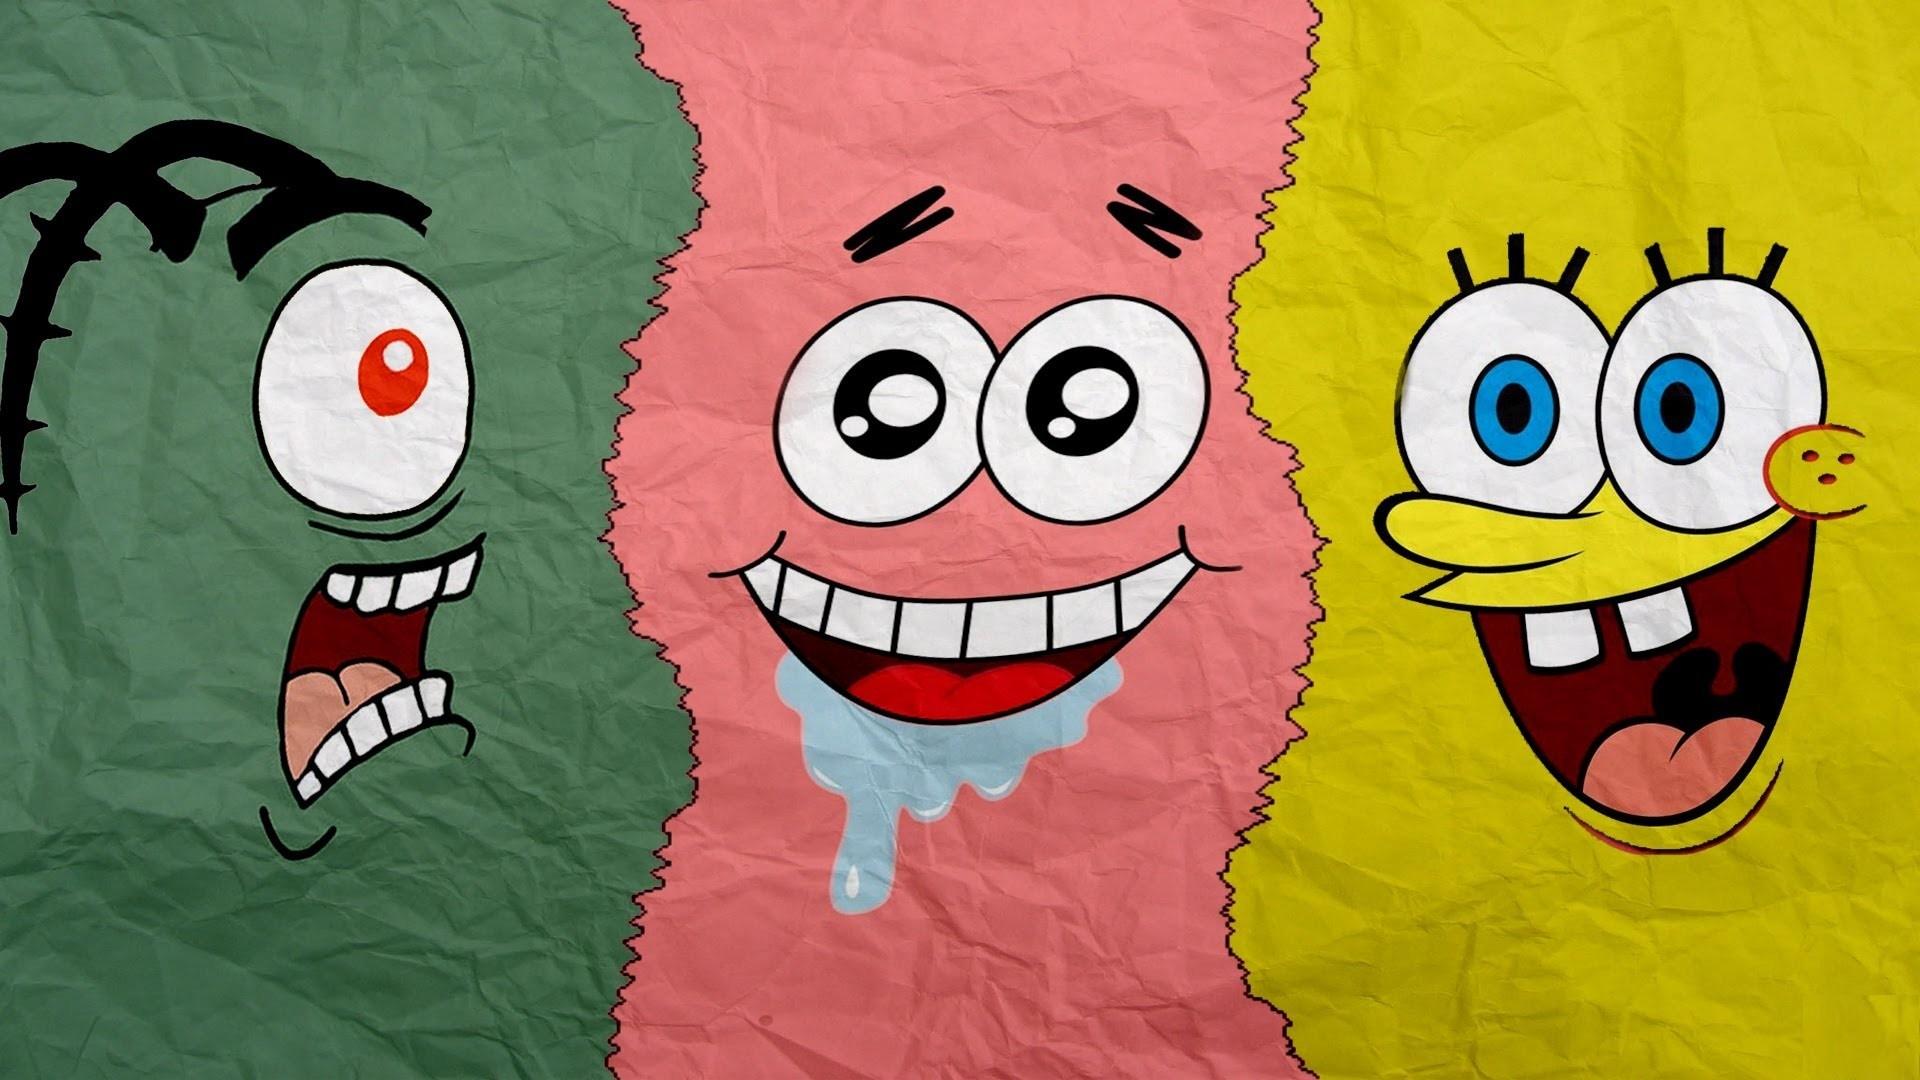 Spongebob Wallpapers HD A17